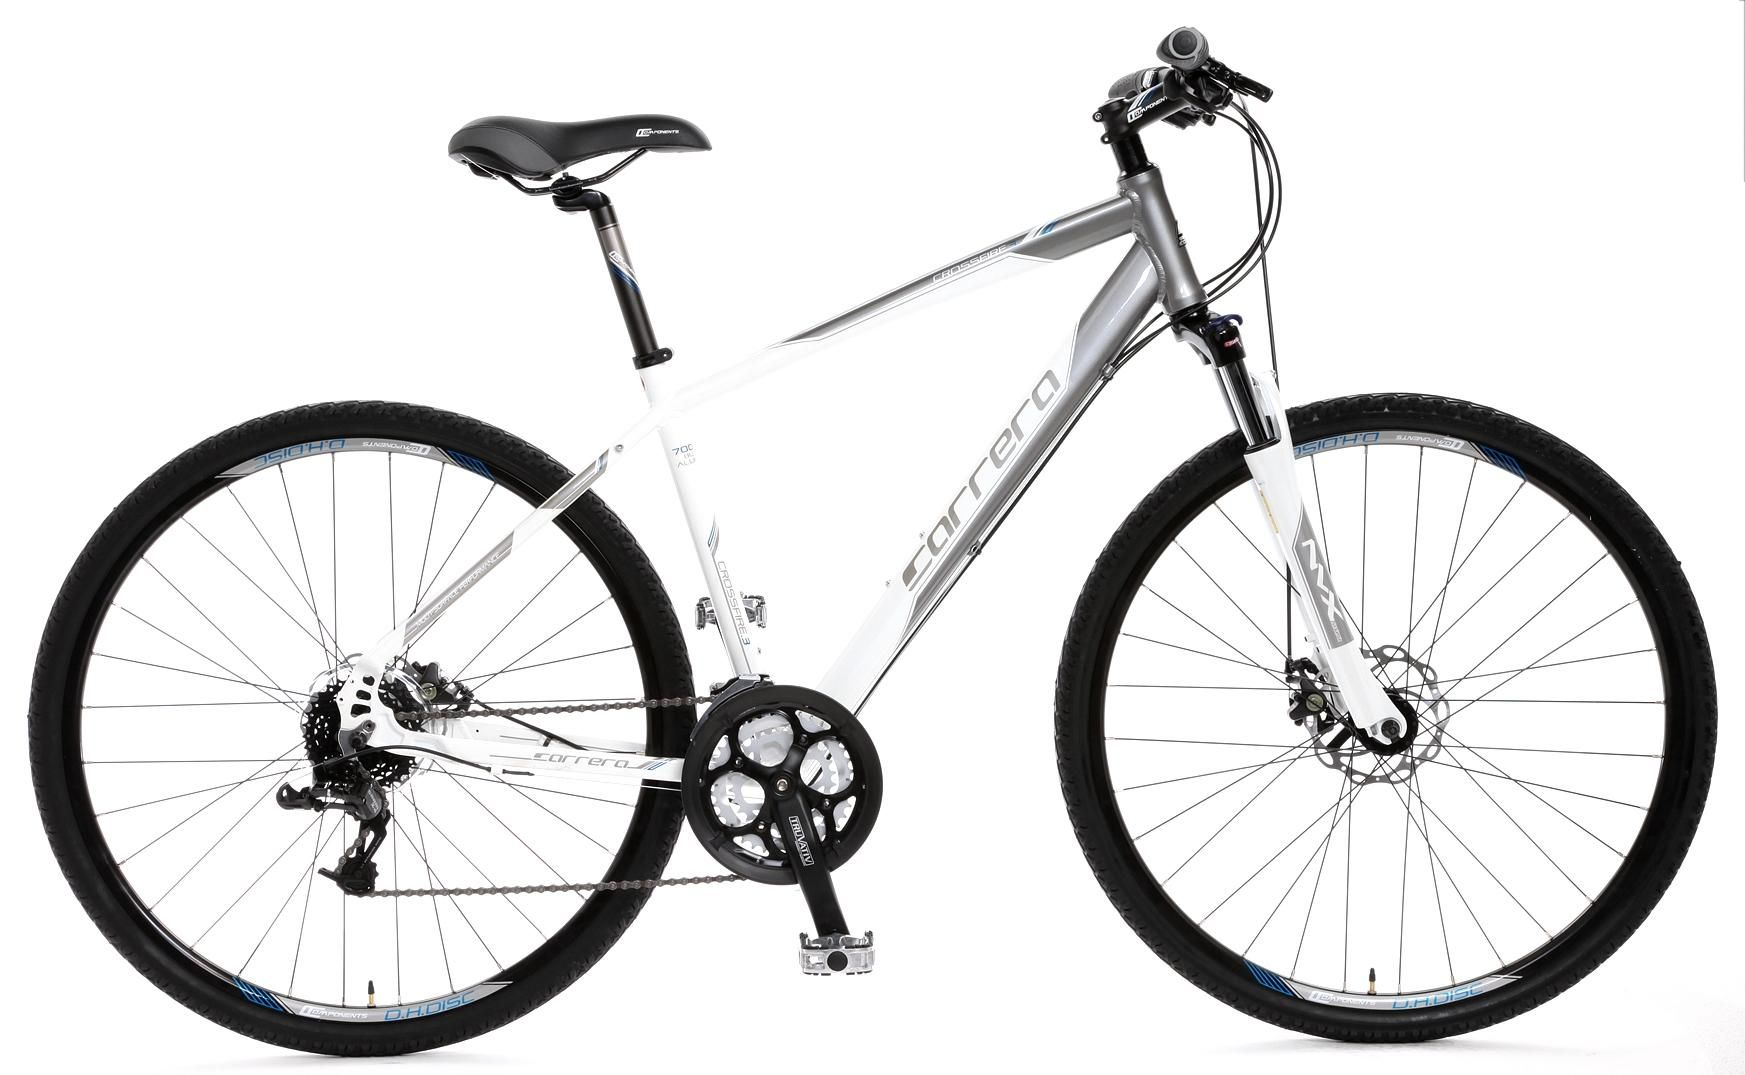 Carrera Crossfire 3 Hybrid Bike Medium 17 inch sports a